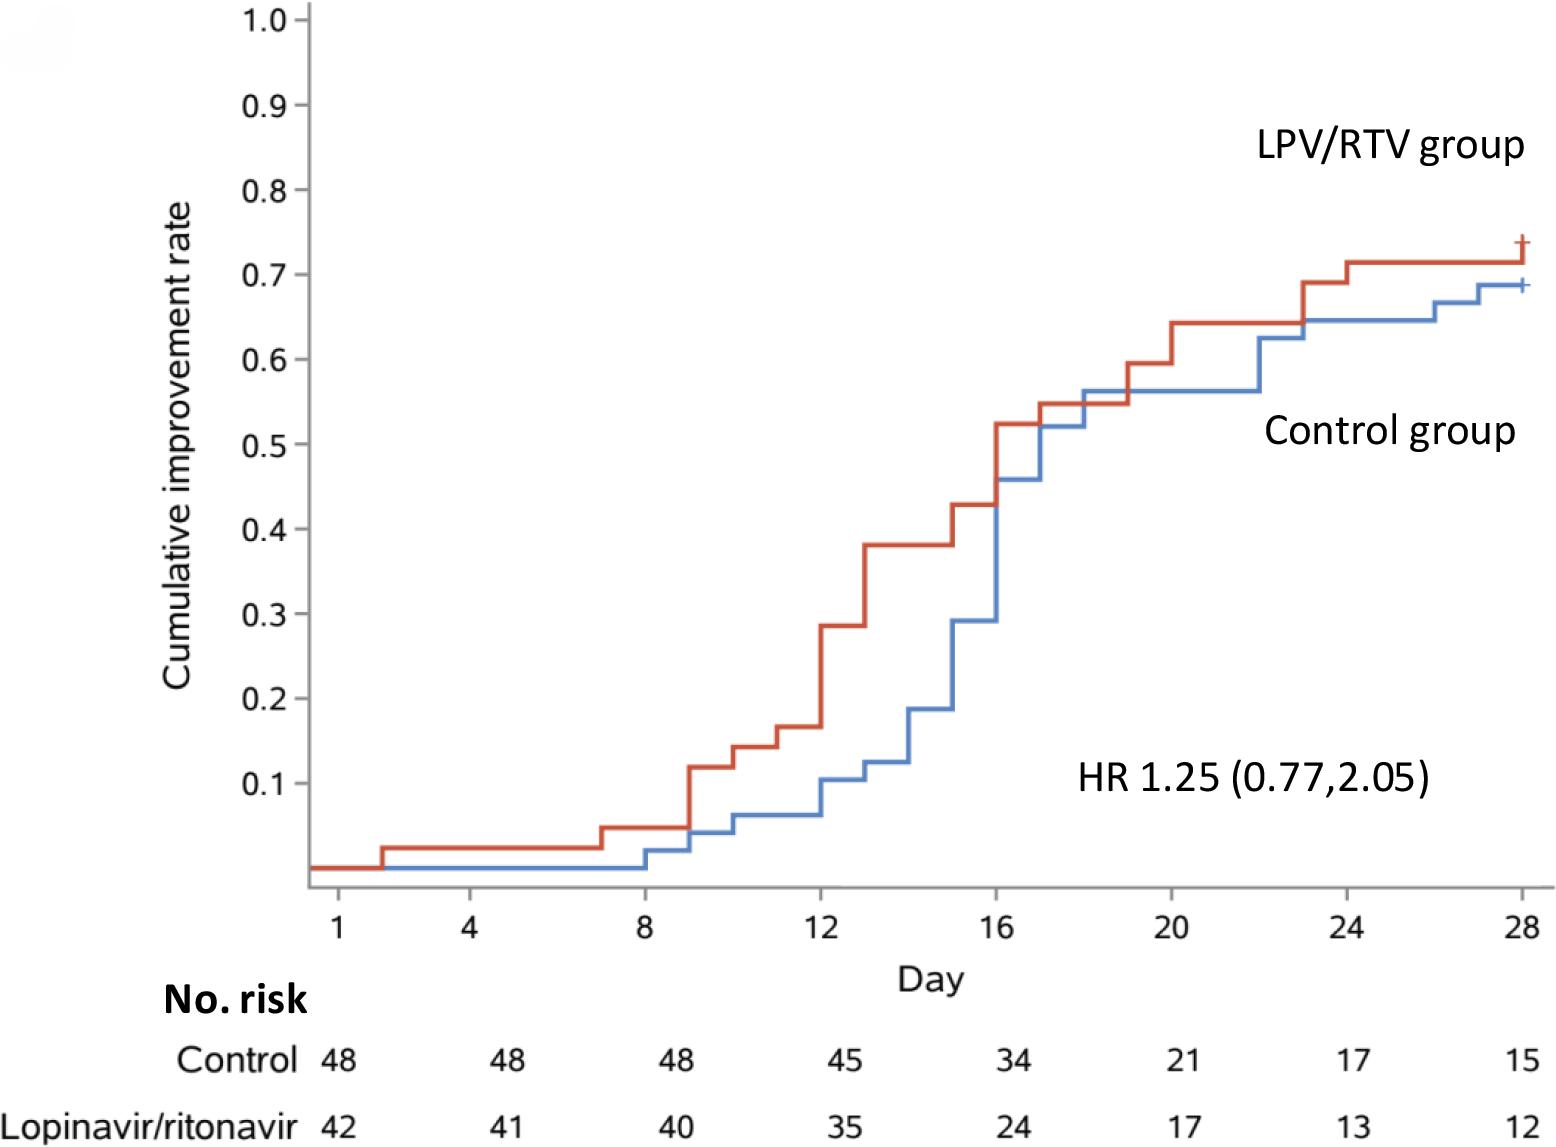 chictr2000029308 results 05 - Коронавирус. Лекарства. Лопинавир и ритонавир не помогли в лечении COVID-19